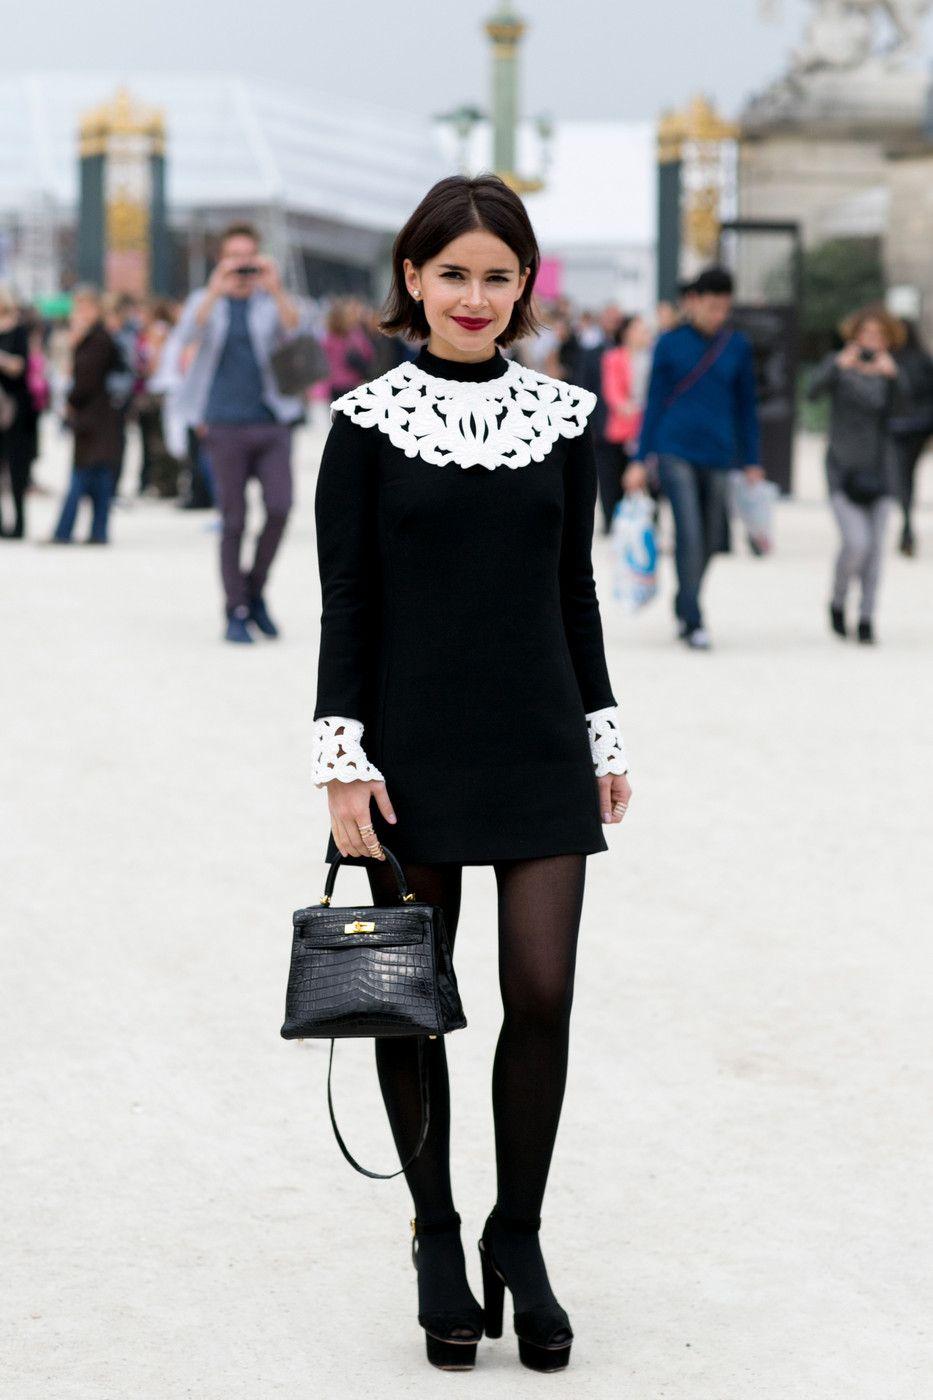 Anti Risih, Ini 5 Cara Mengakali Fashion Item yang Terlalu Pendek